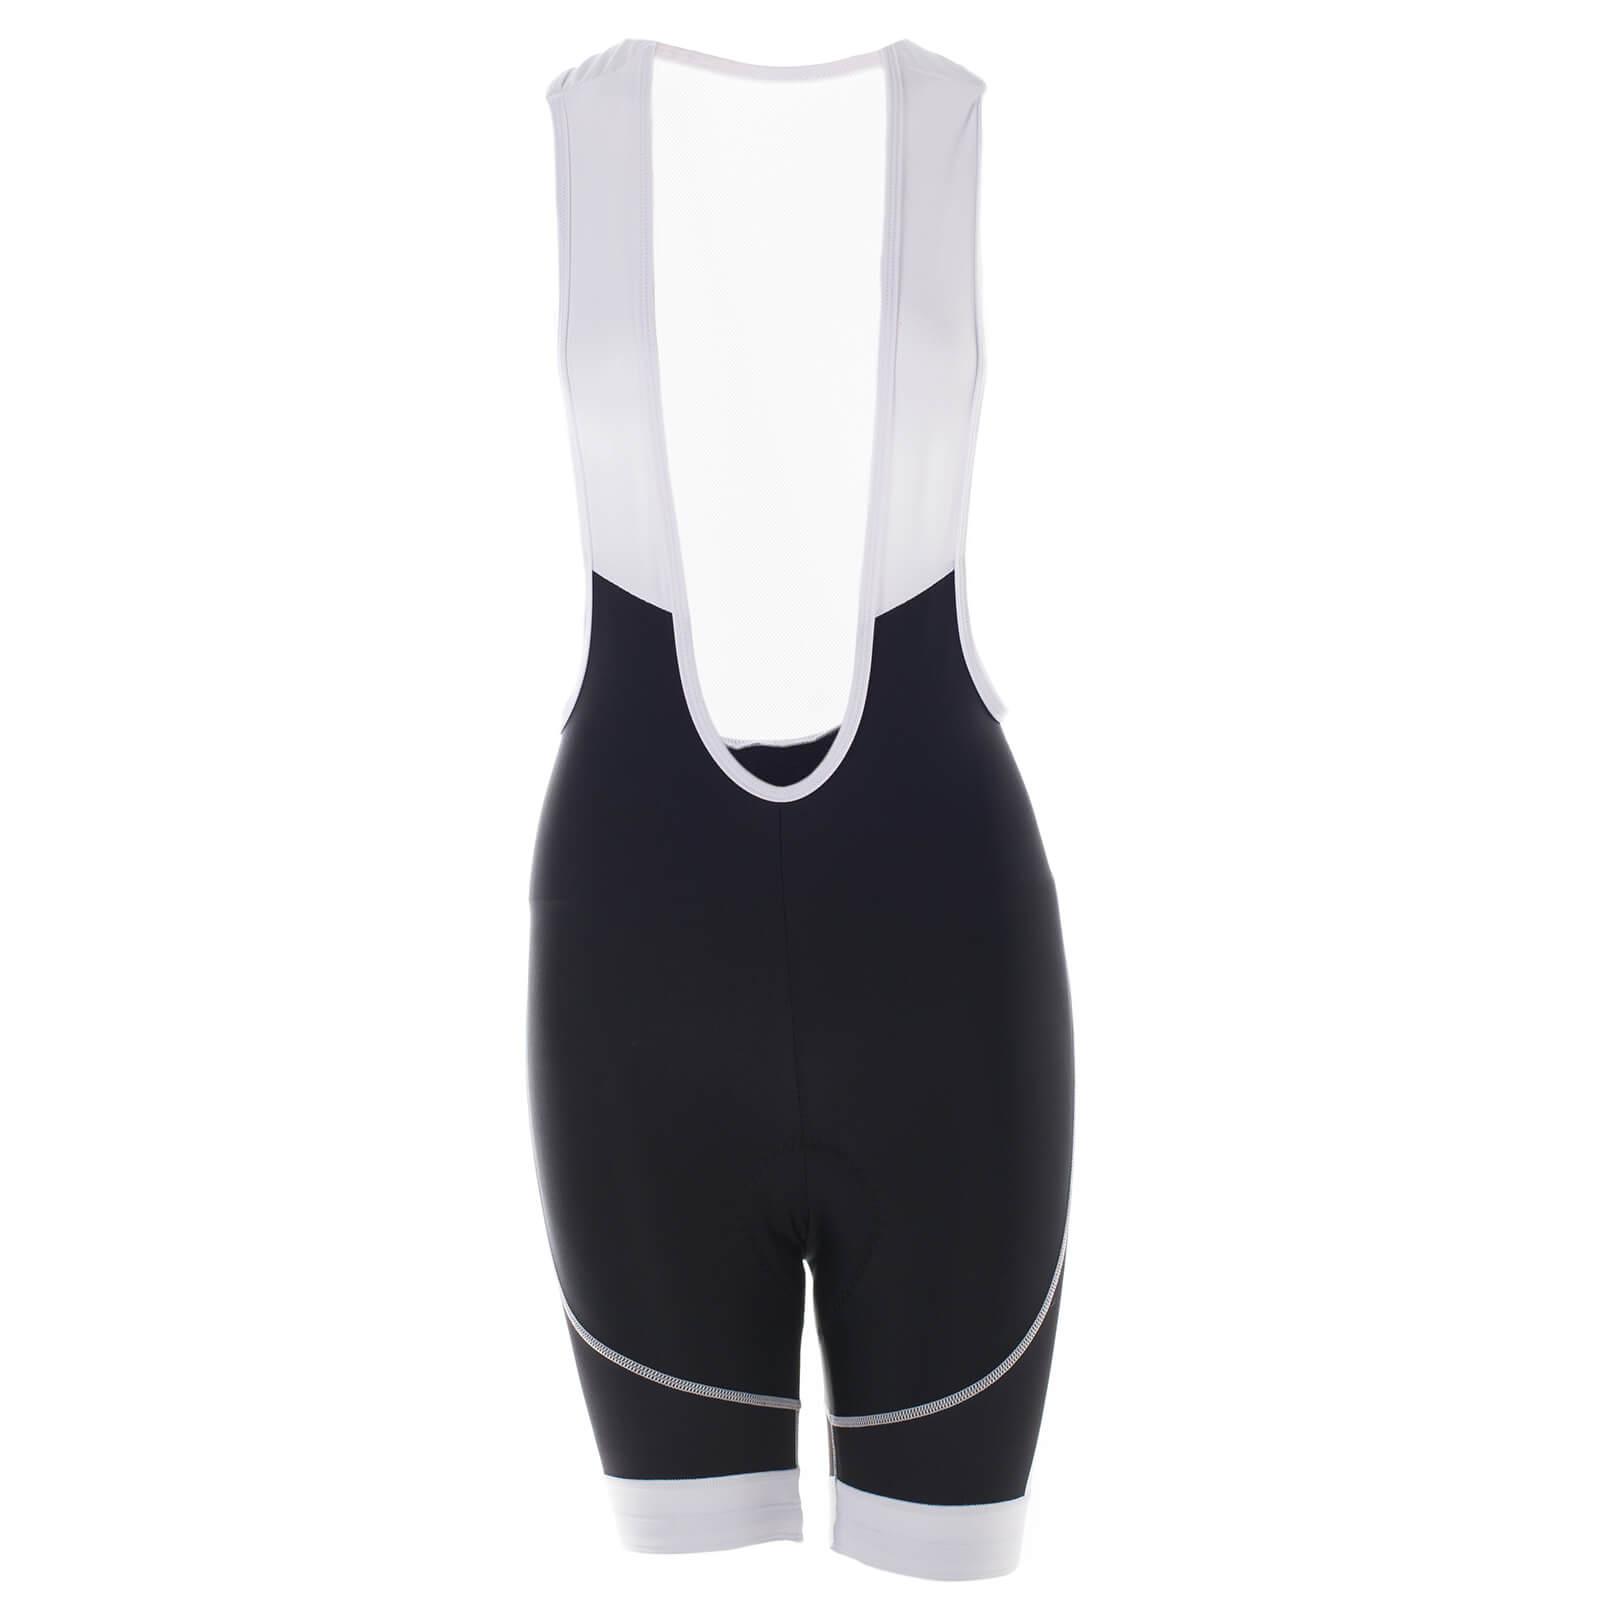 Primal Women's Onyx Prisma Bib Shorts - Black/White